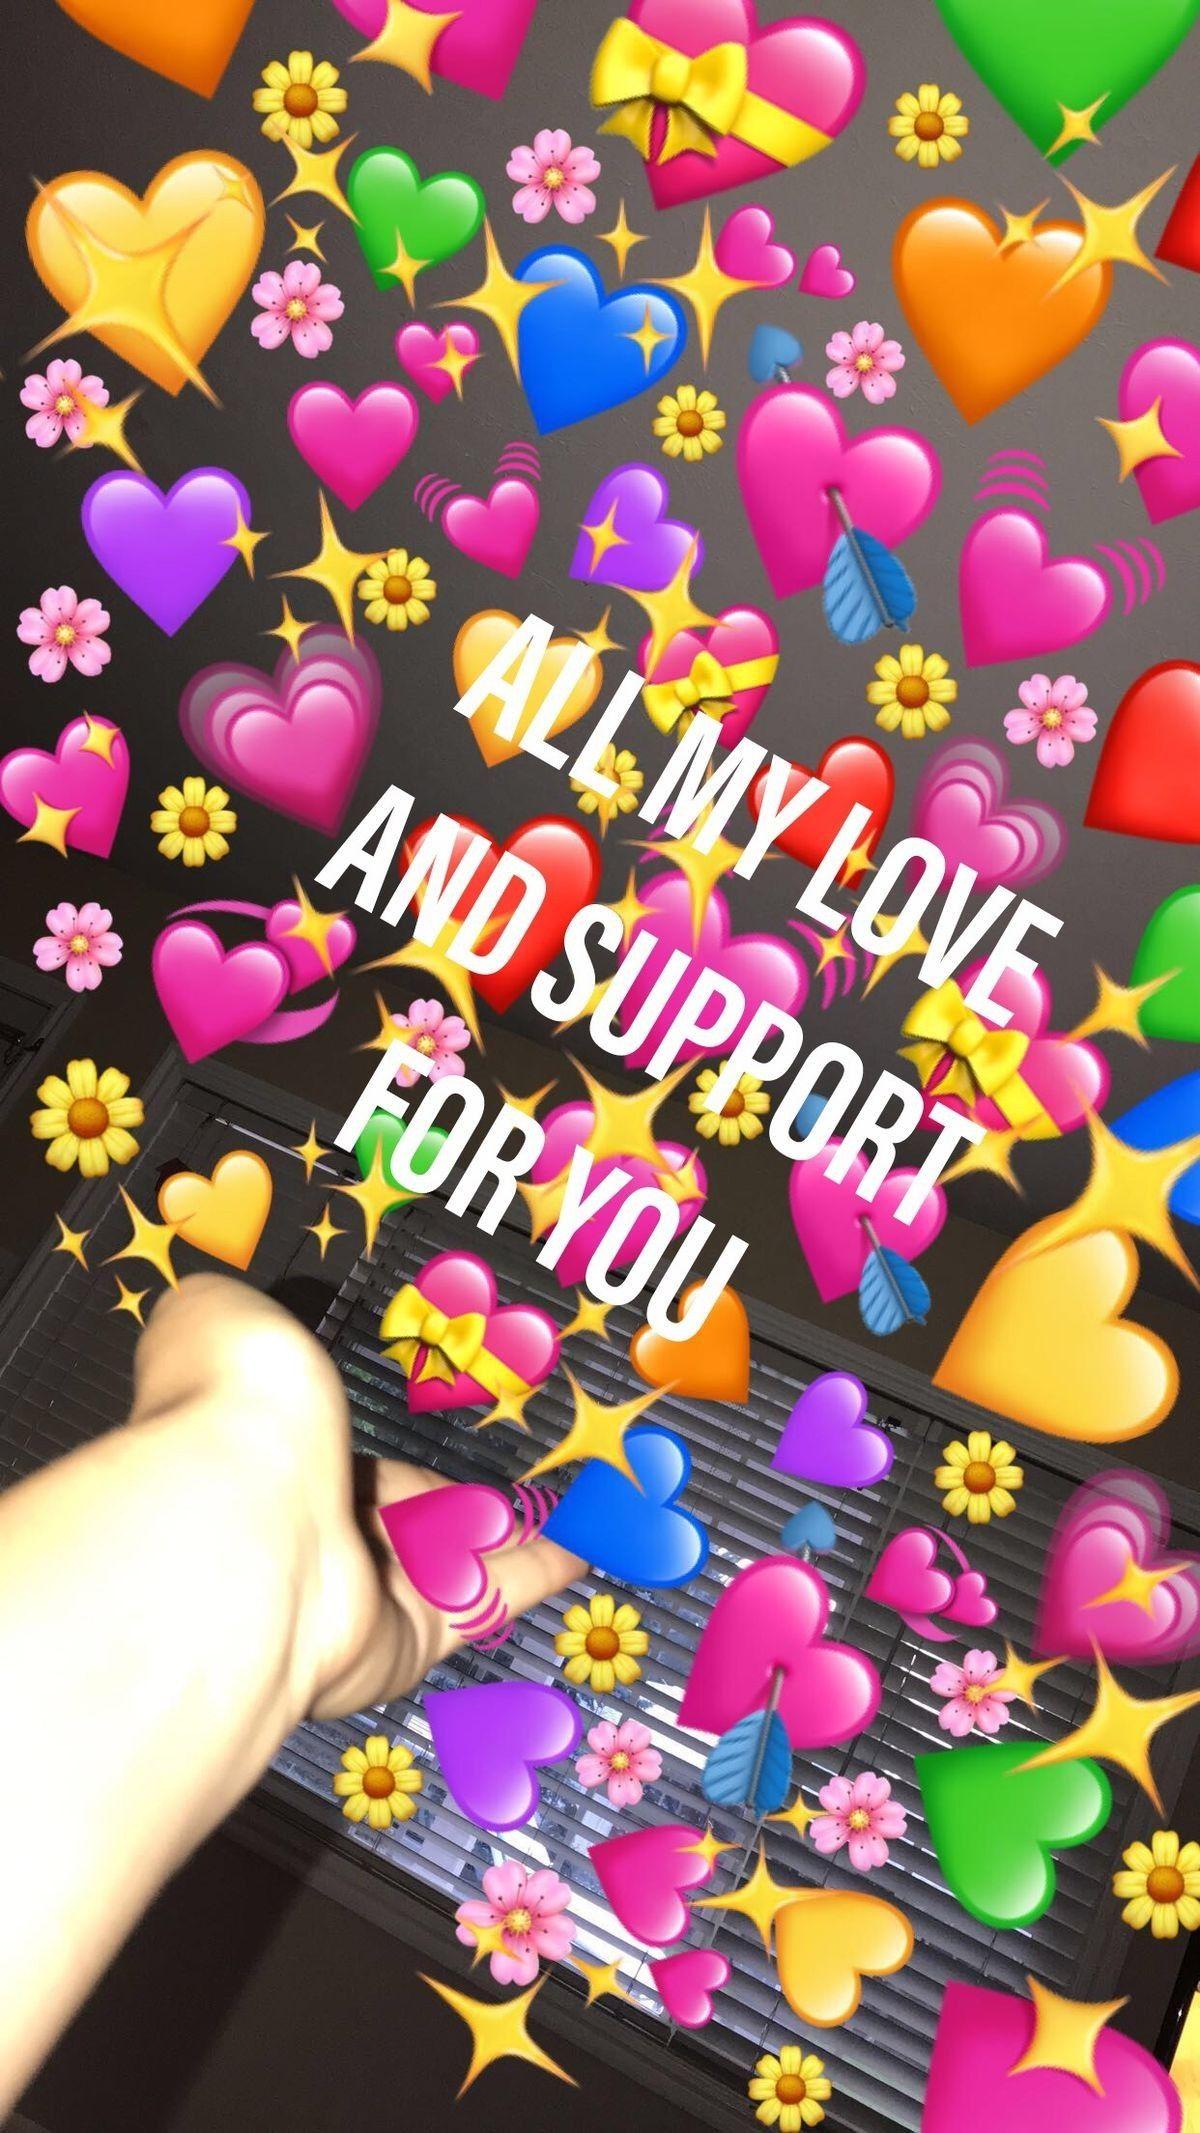 Pin by Elle on inlove Cute love memes, Love memes, Cute